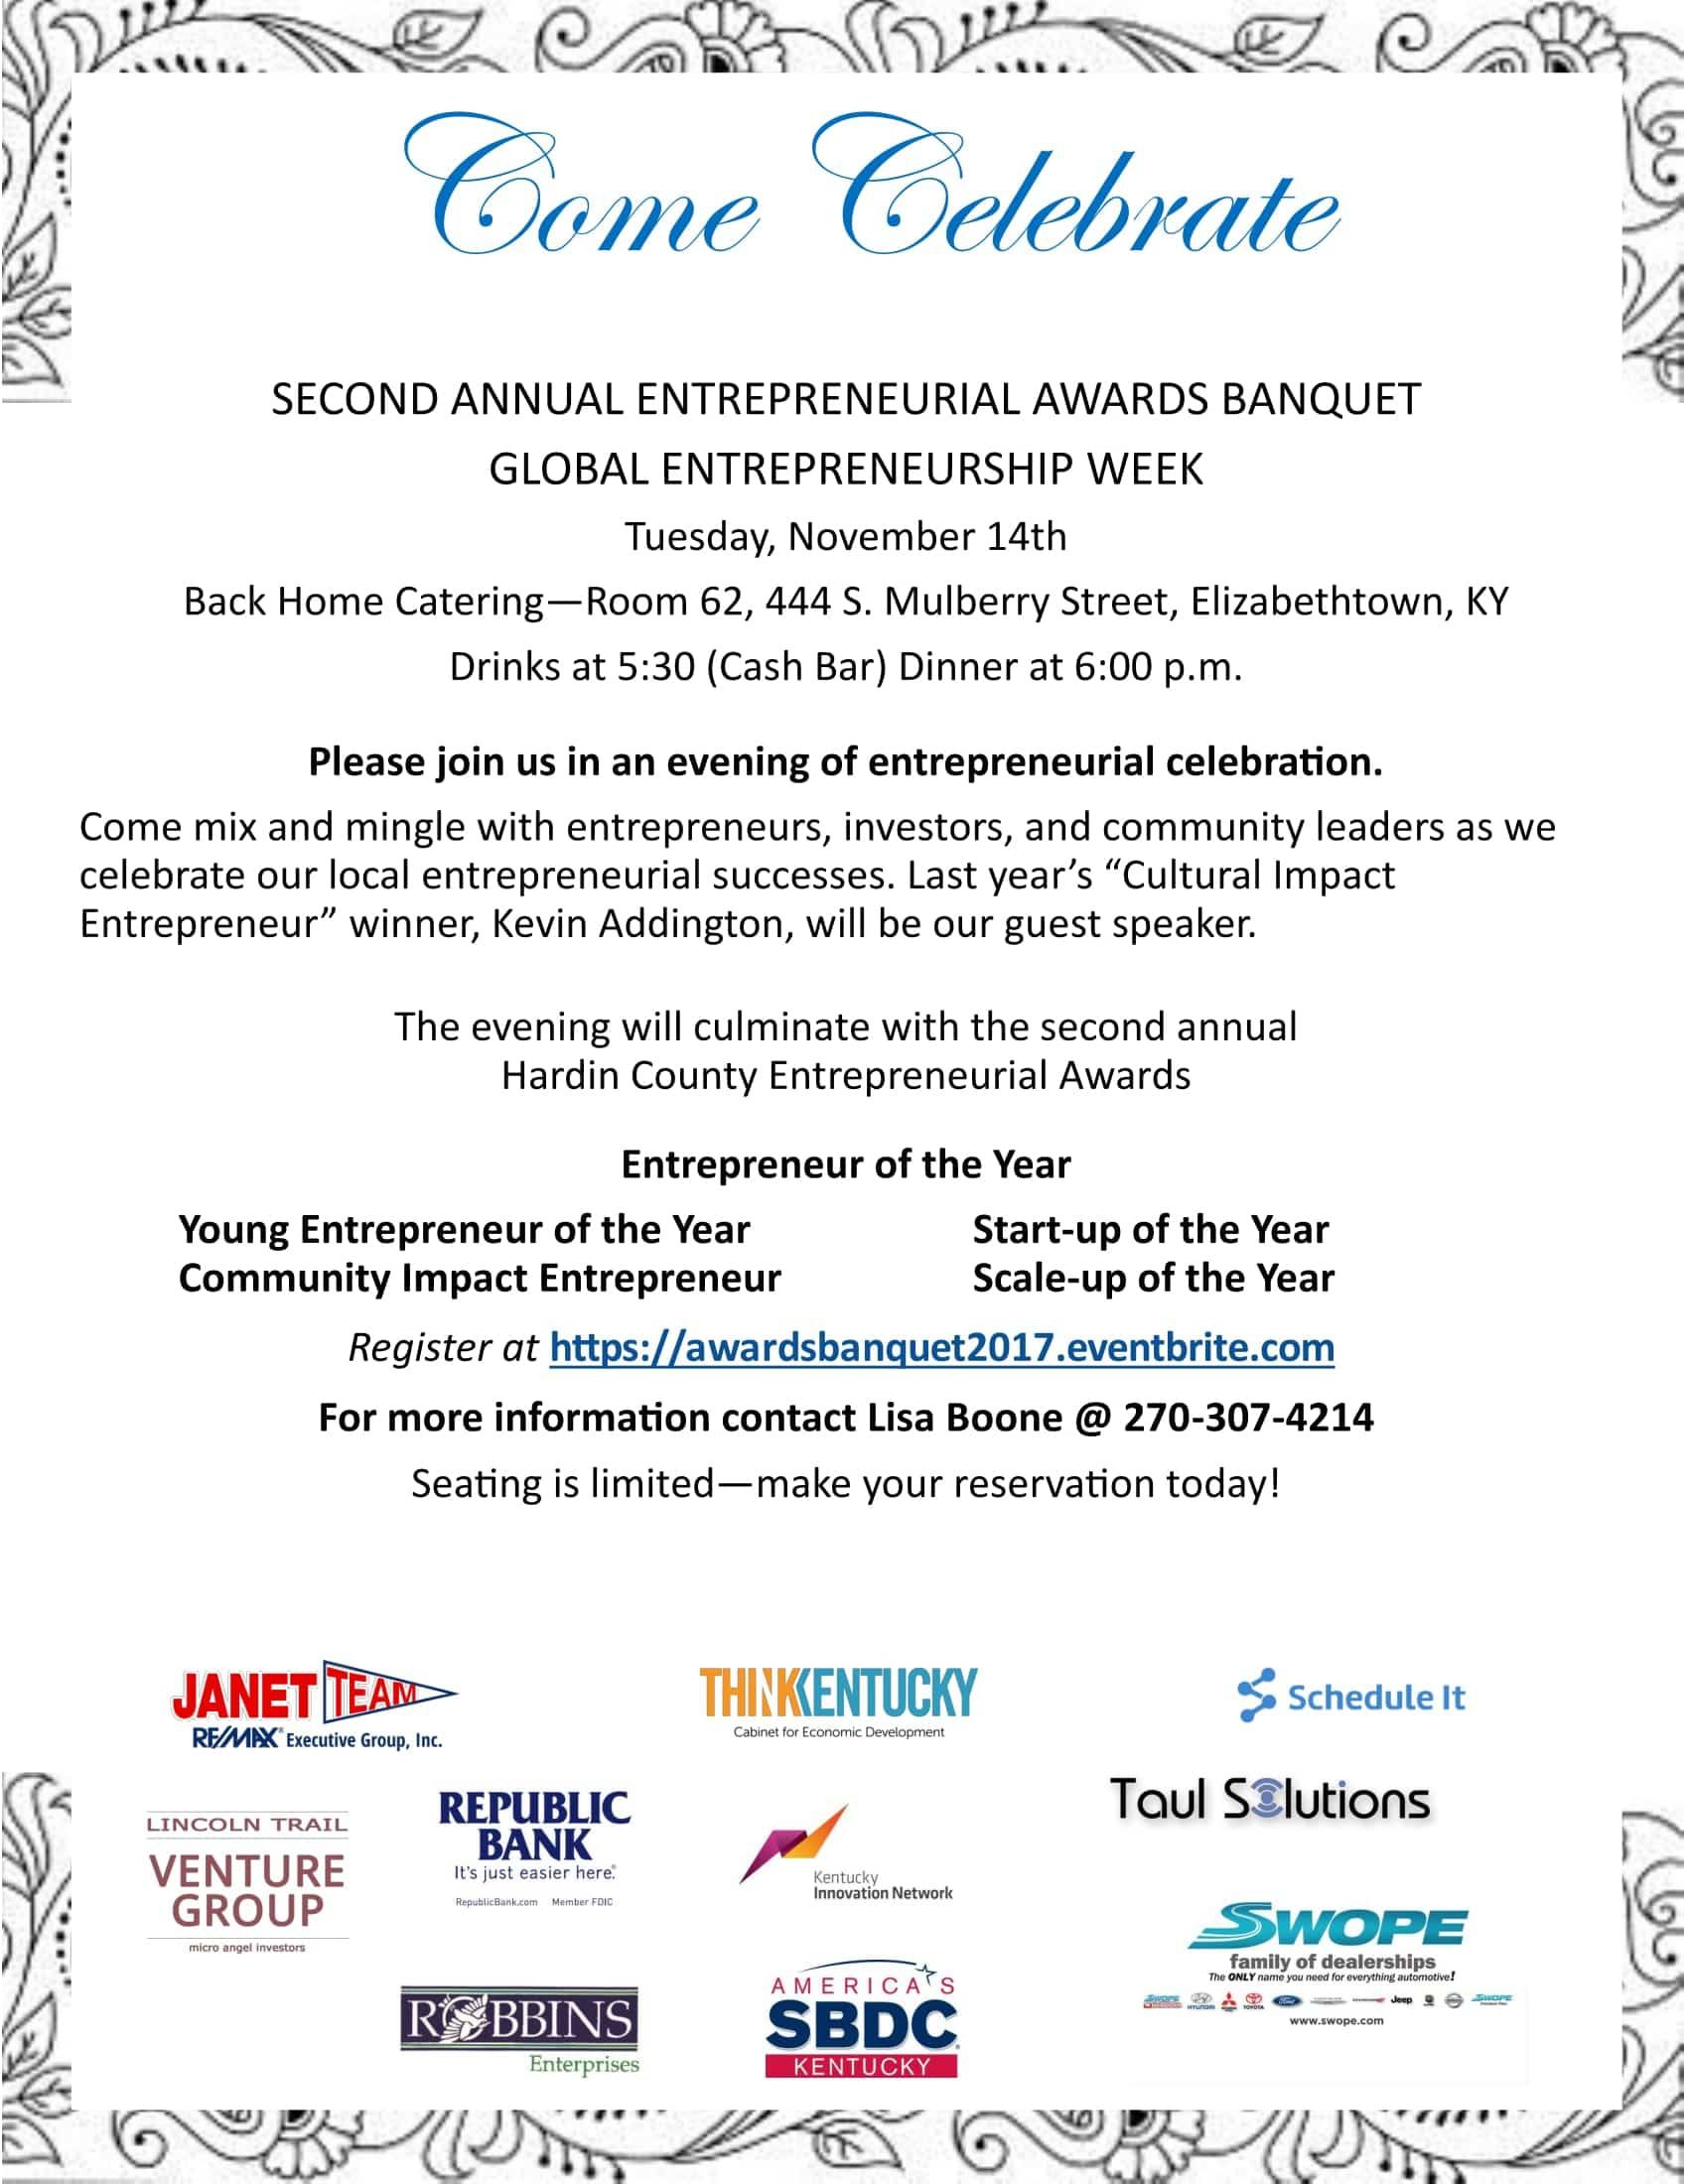 2017 Entrepreneurial Awards